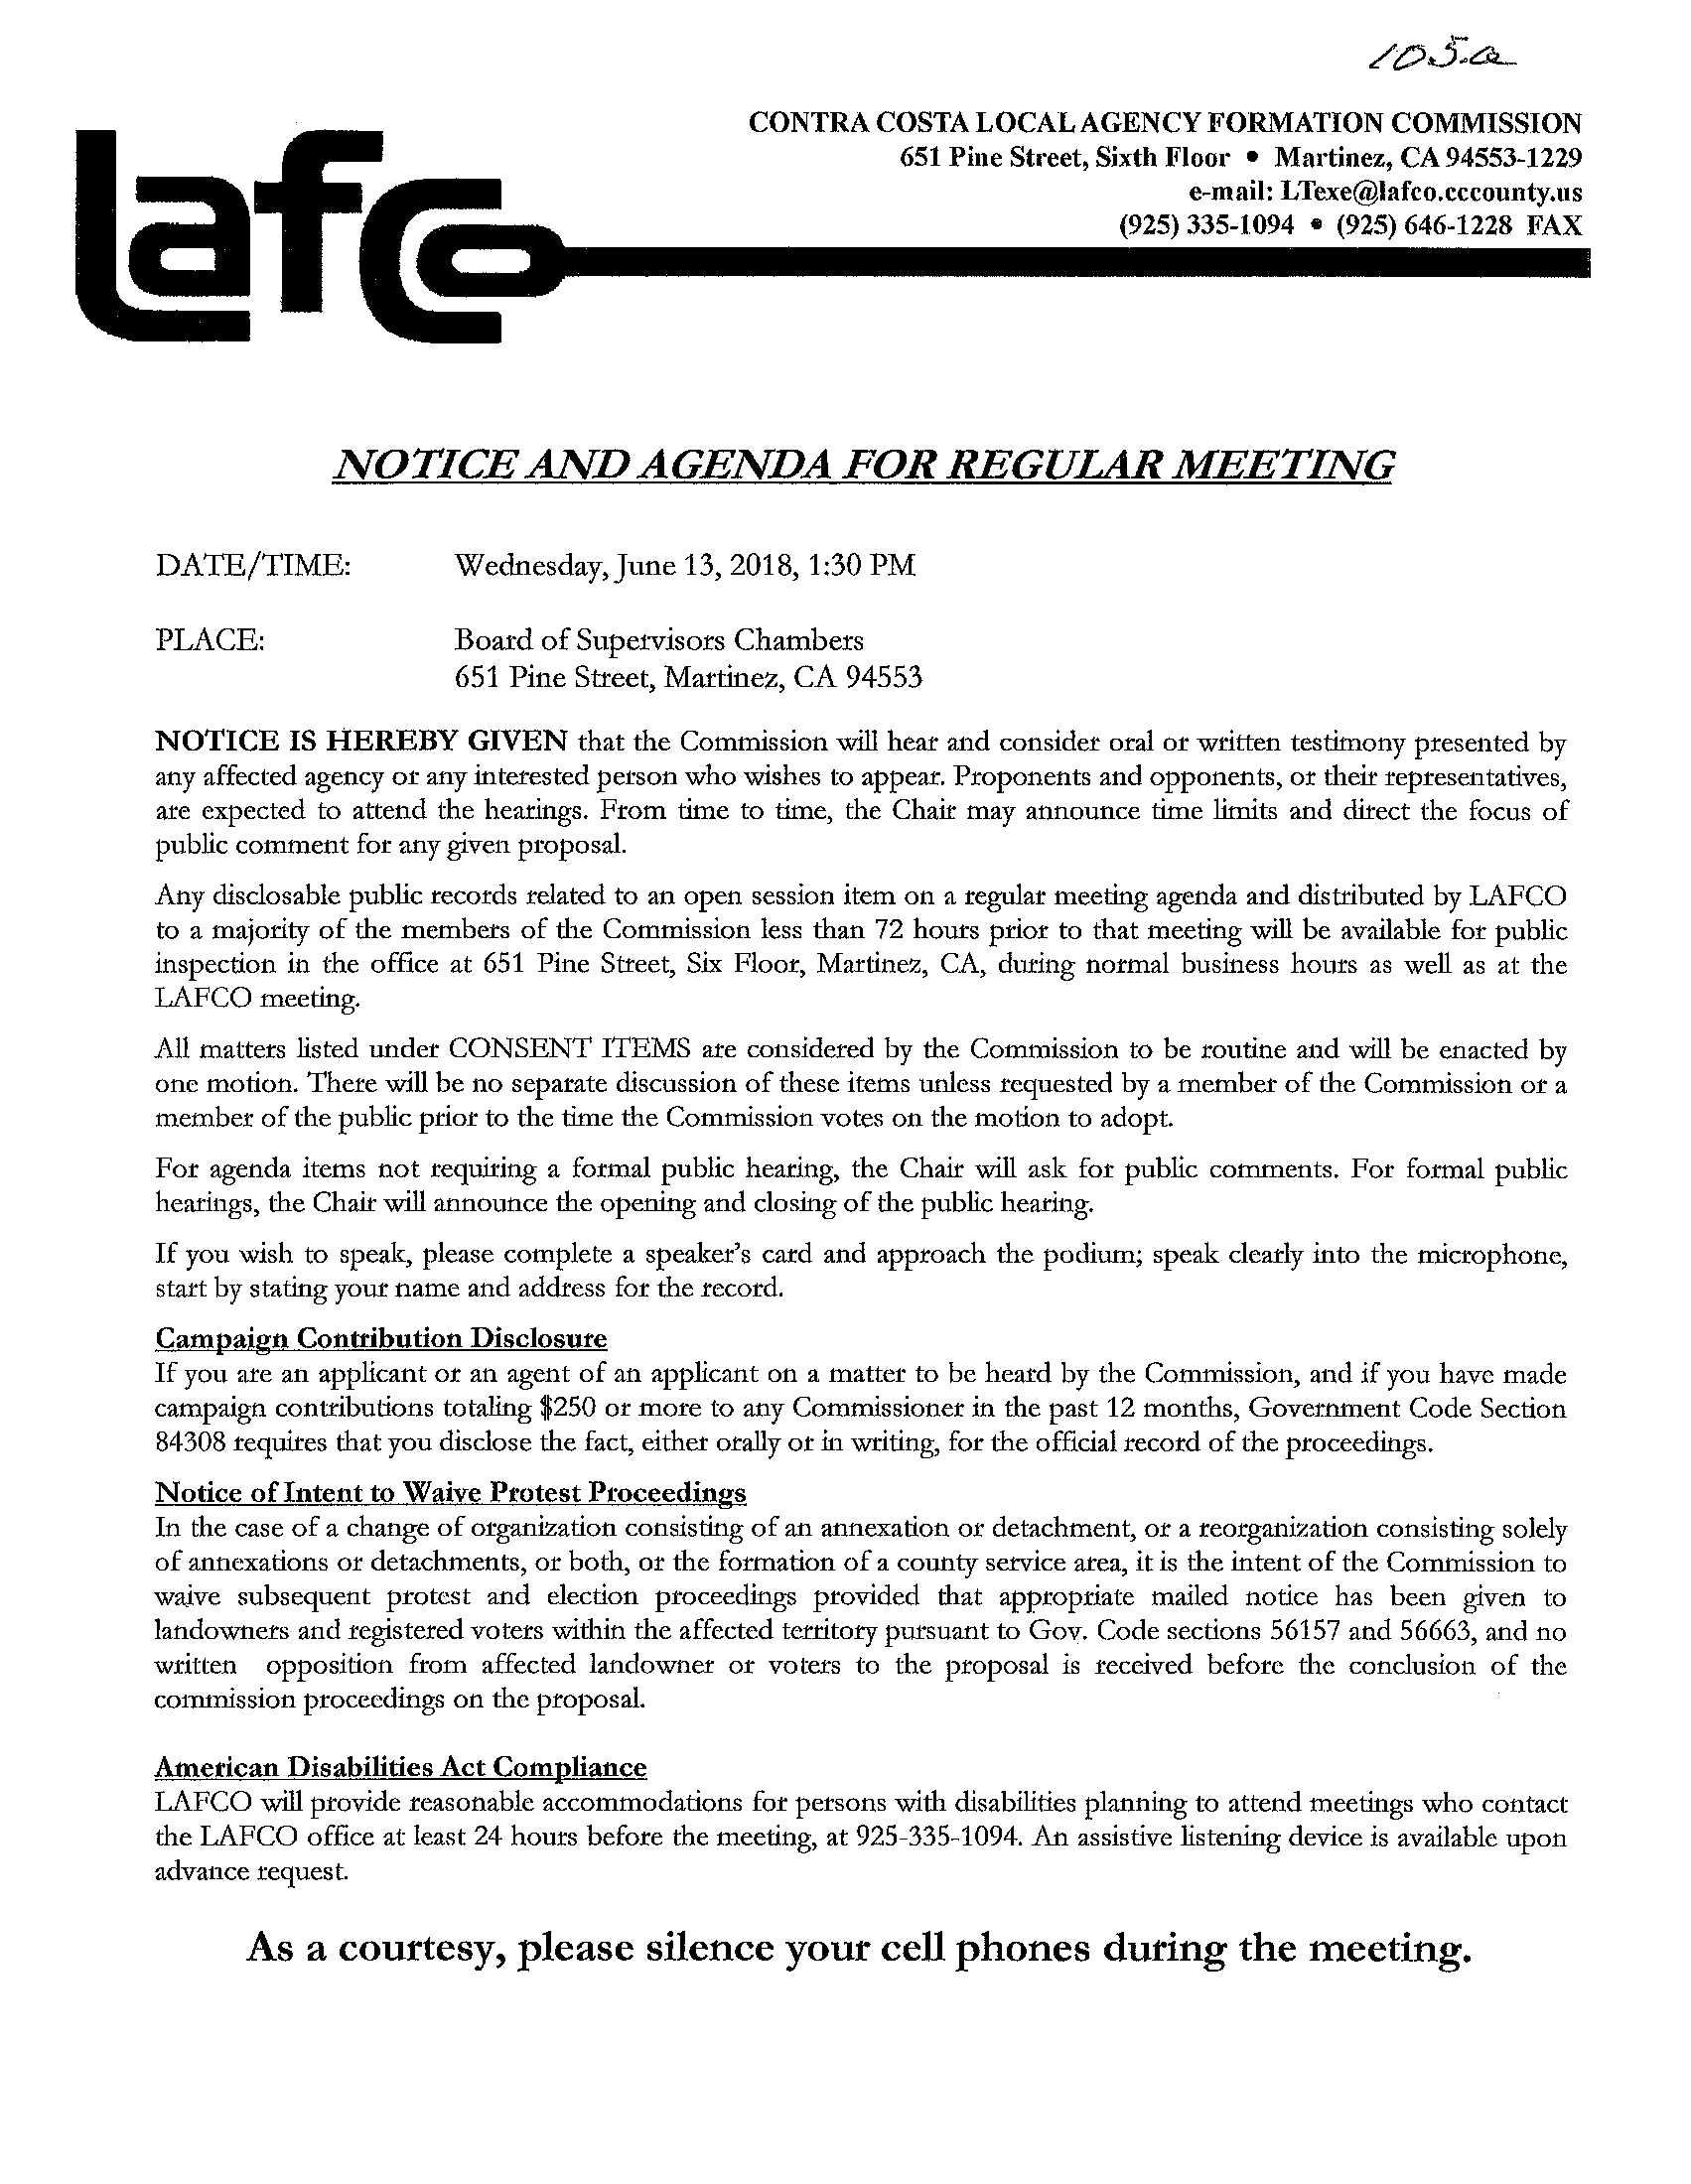 ESMAC Agenda 7.11.2018 (36 Pages)_33.jpg